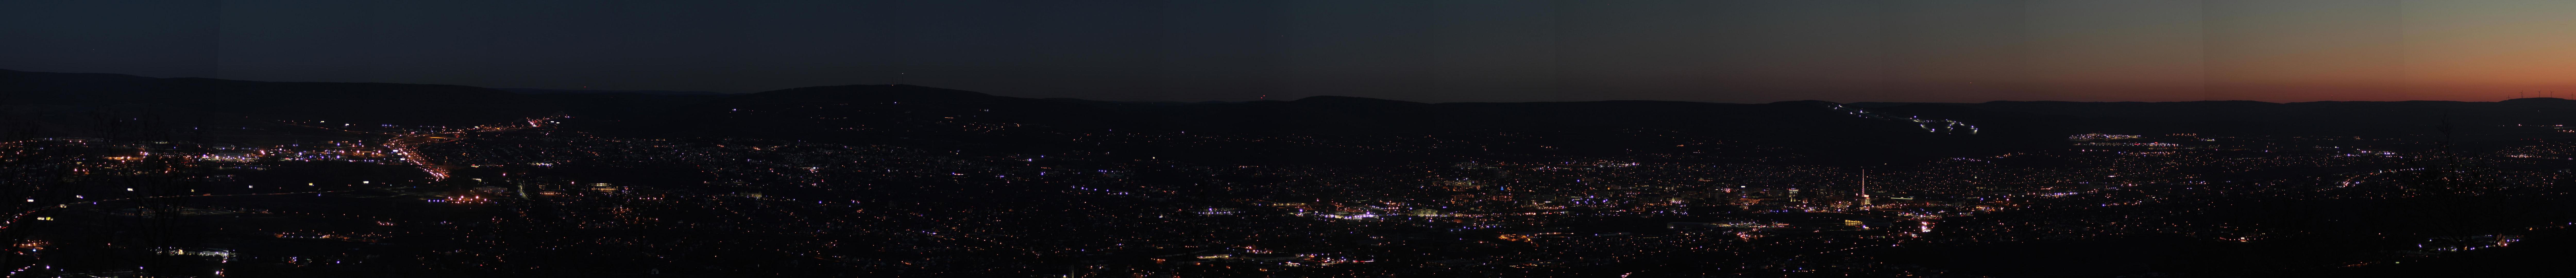 Scranton Panorama